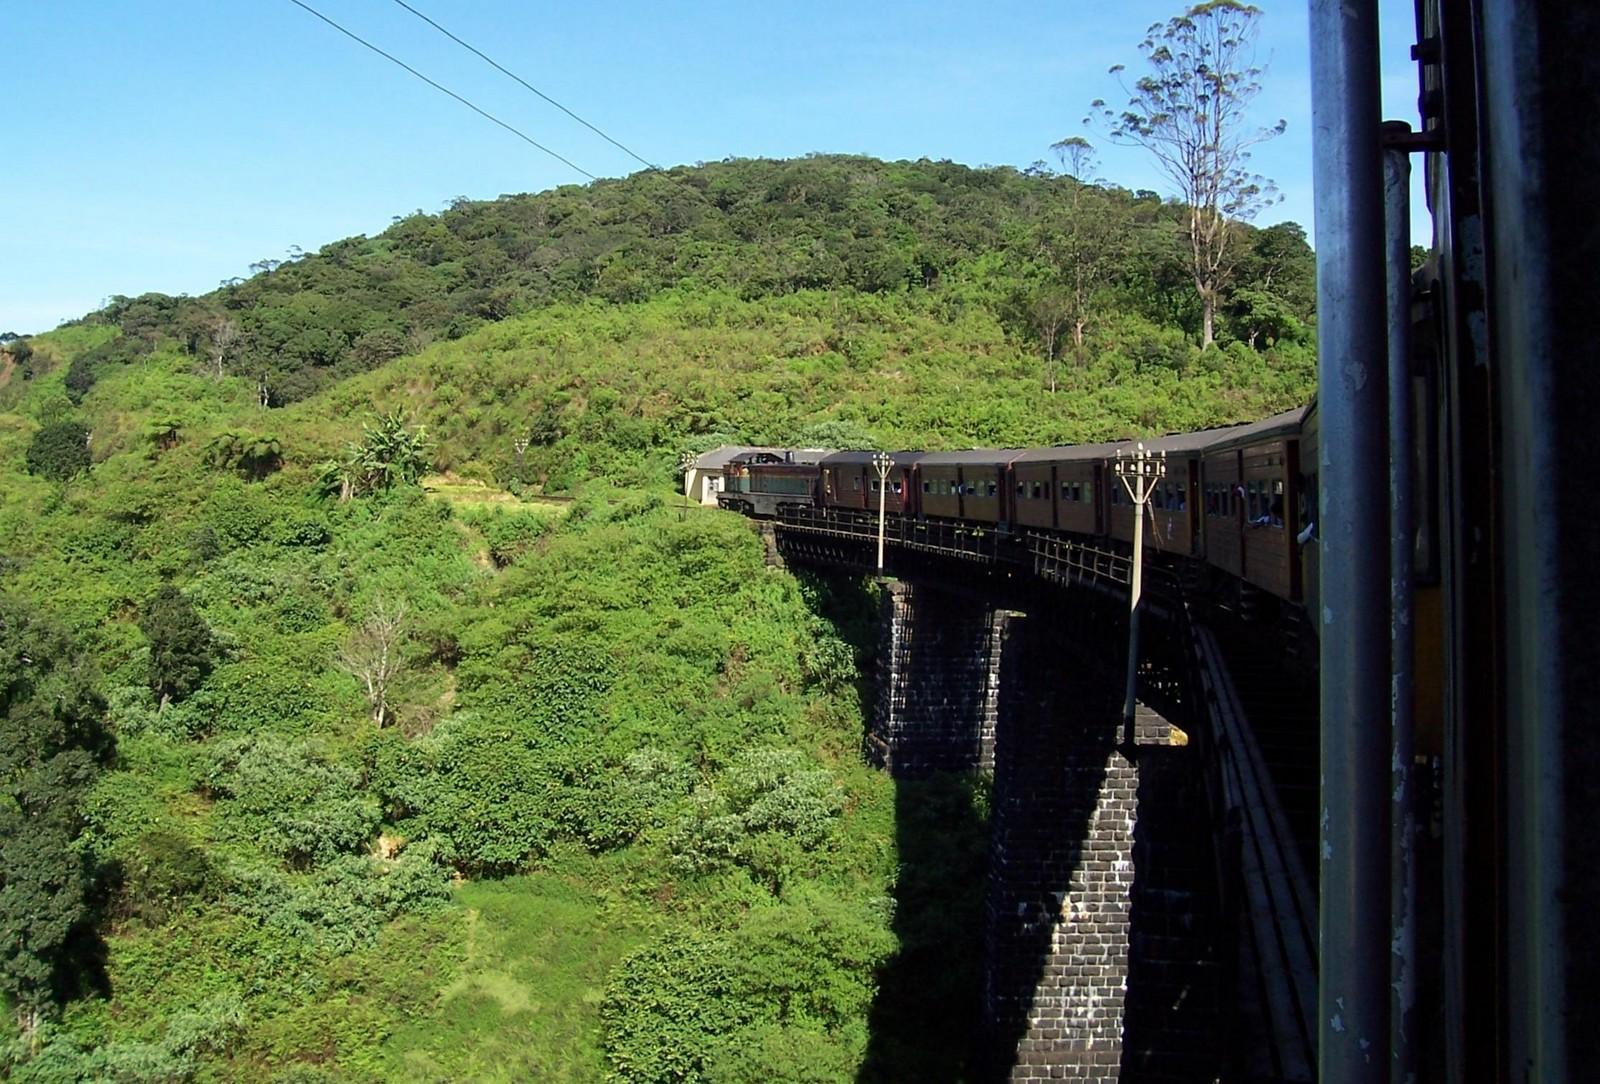 Hochlandbahn / Main Line Ceylon